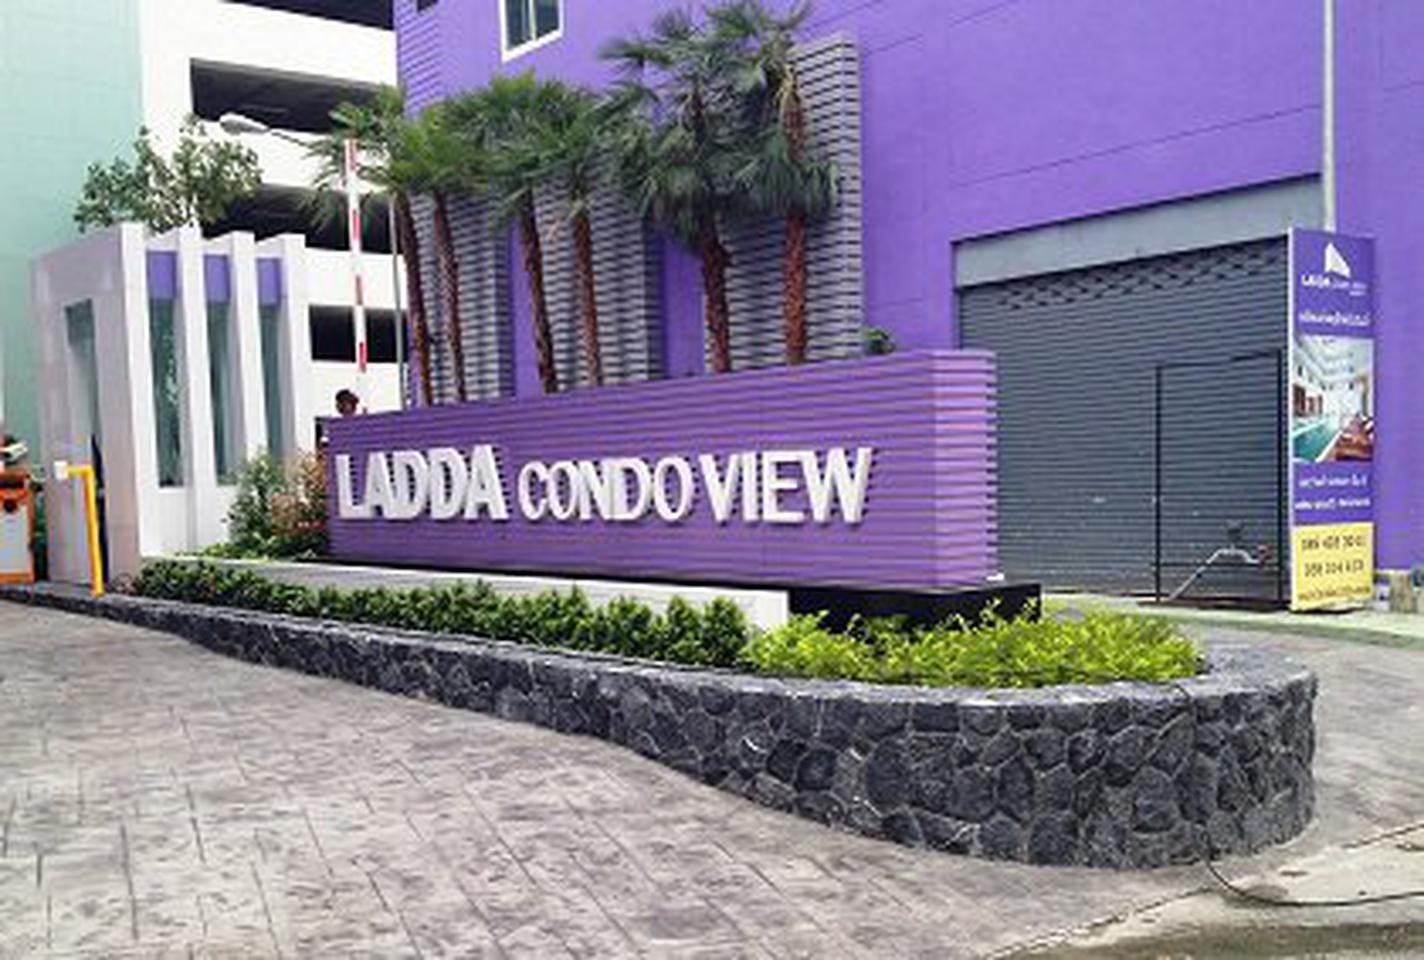 Ladda Condo View คอนโดให้เช่า ใจกลางศรีราชาของแท้ เดินทางง่าย ใกล้ทะเล วิวทะเล เห็นเกาะลอย  สิ่งอำนวยความสะดวกครบครัน รูปที่ 2